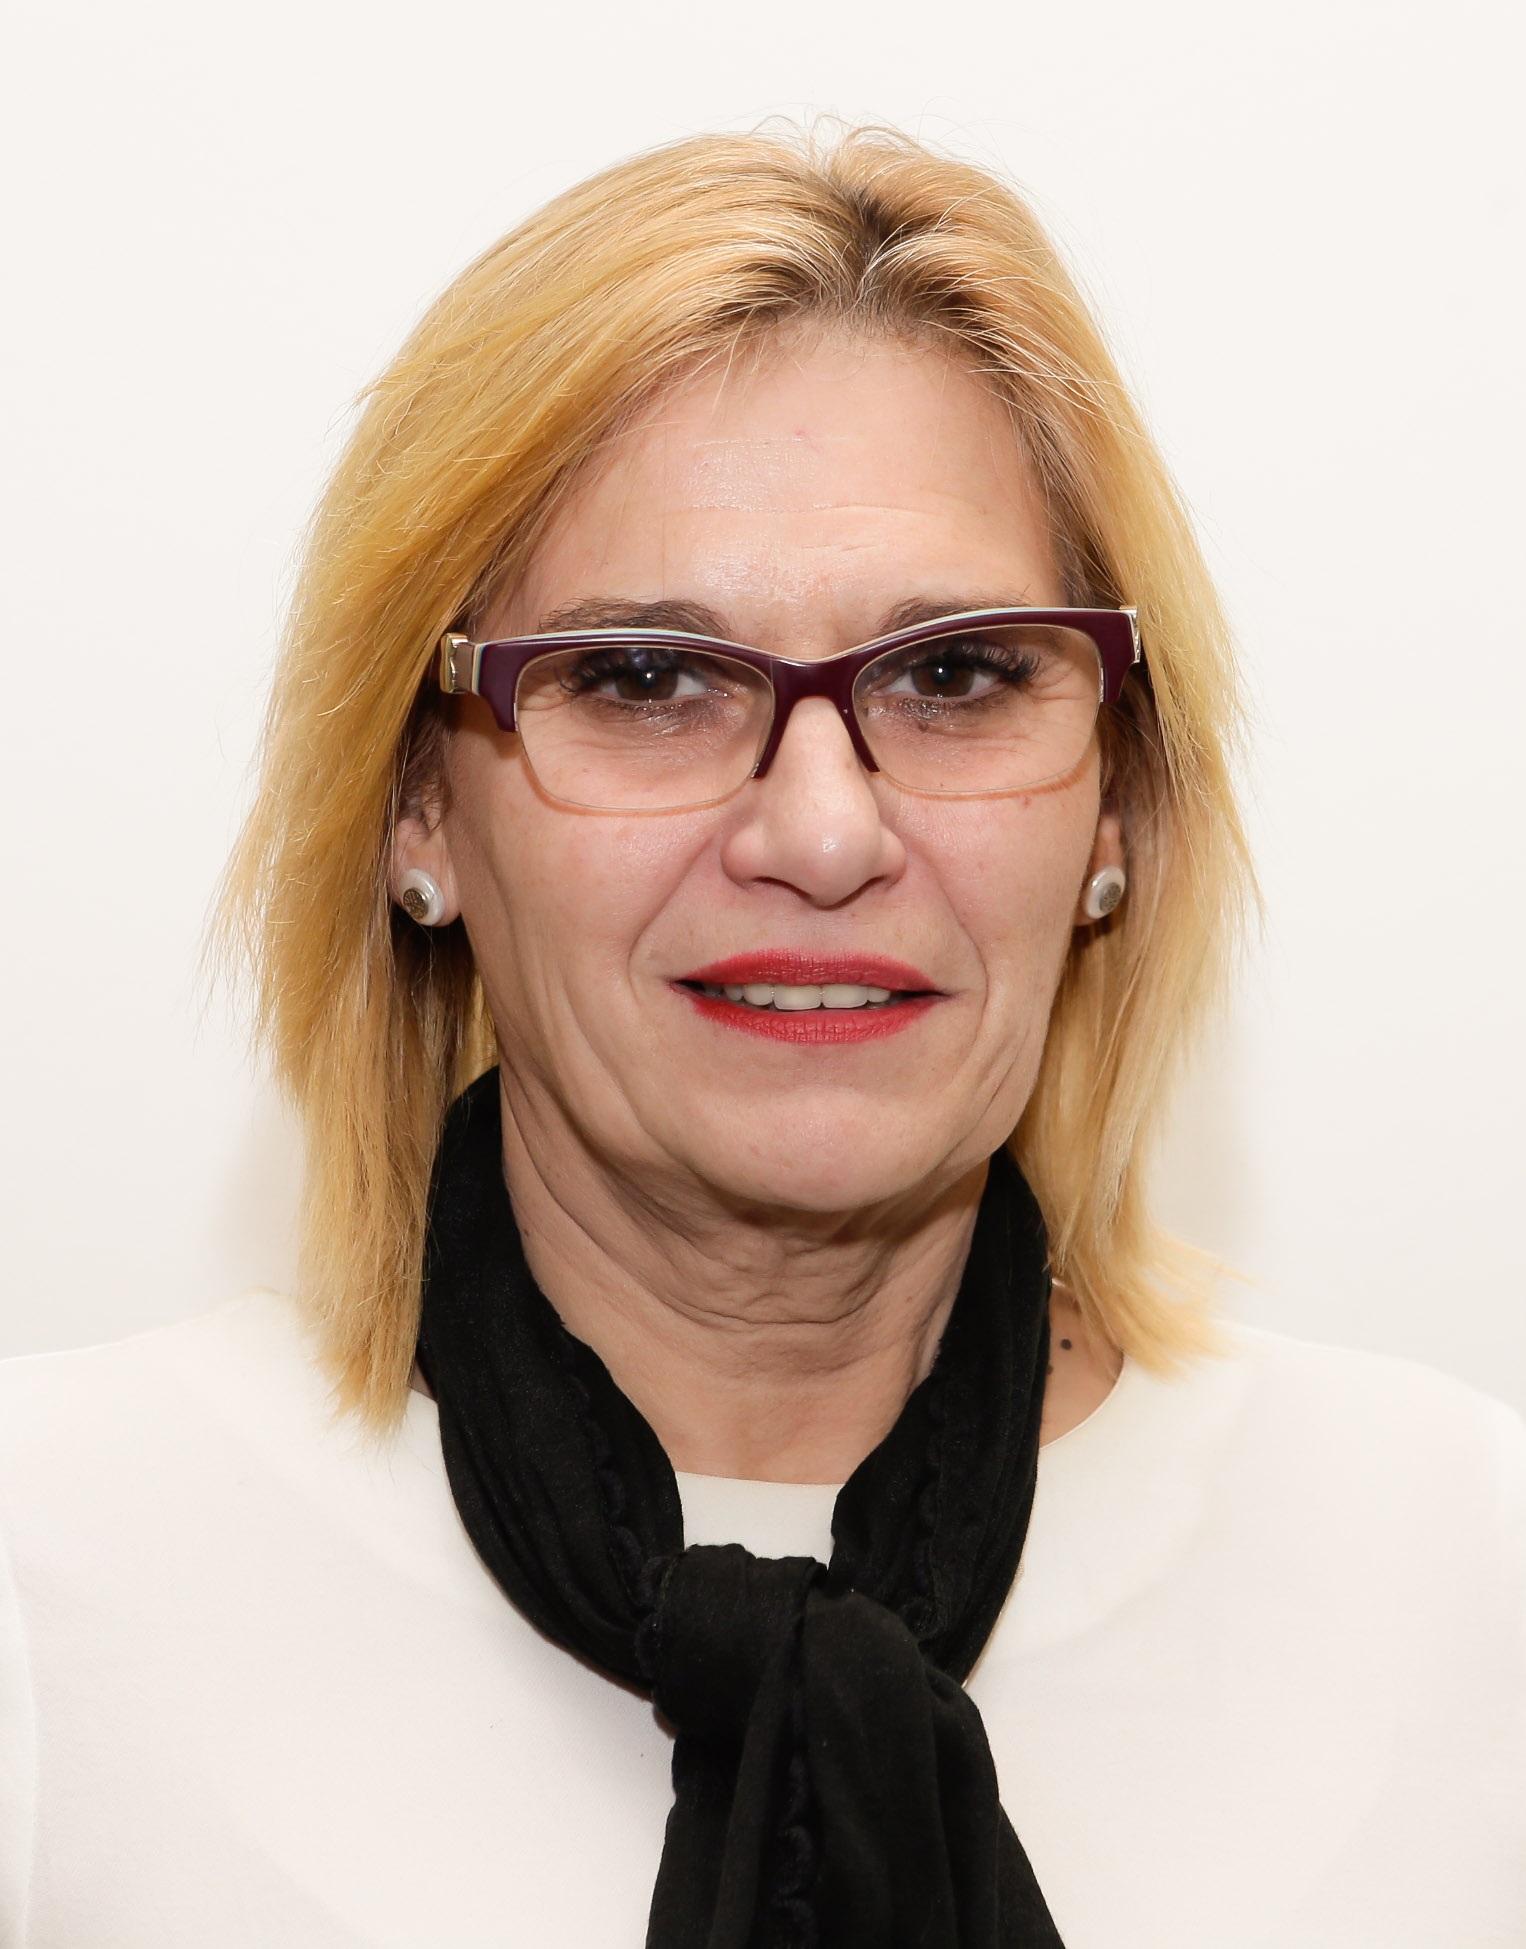 Argazkiak GUADALUPE MARÍA CASANOVA BARAGAÑO